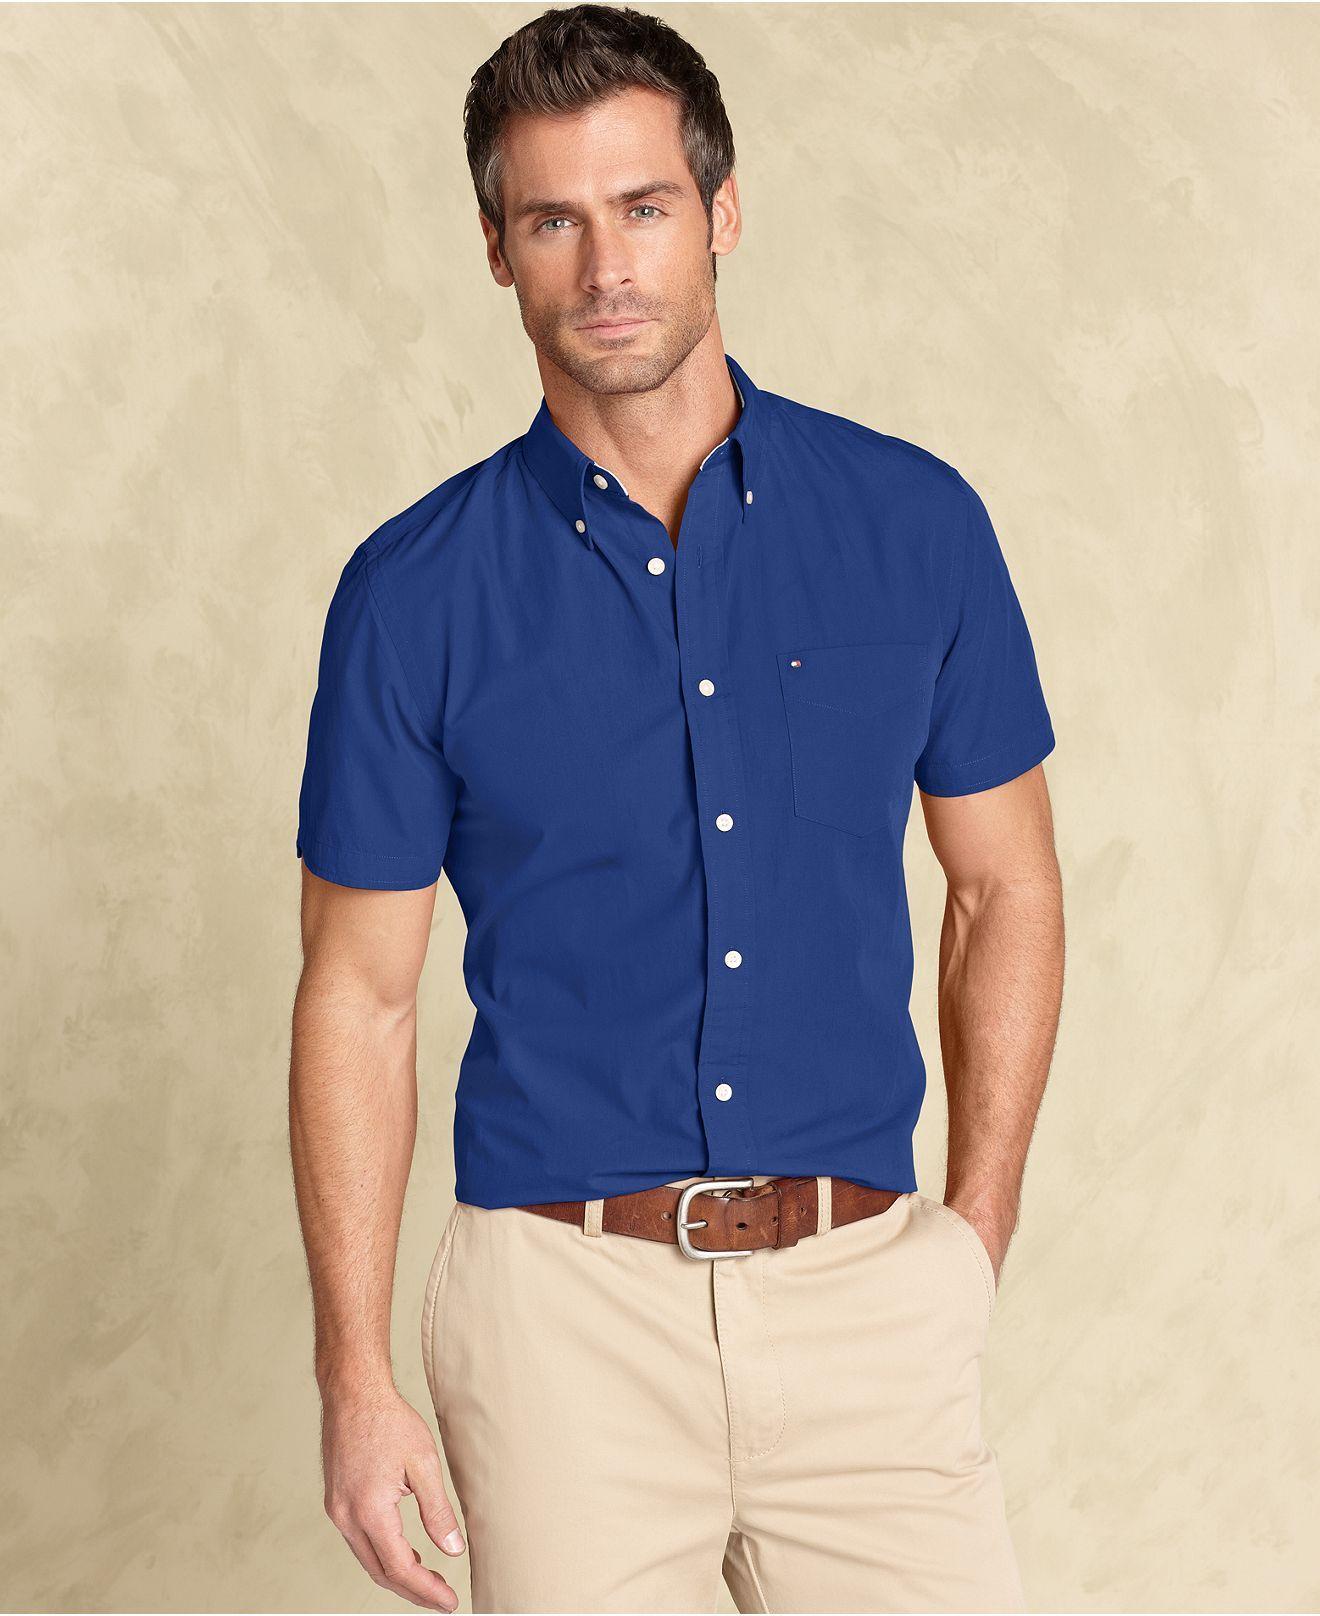 Tommy Hilfiger Shirt, Max Fashion Slim Fit Button Down Shirt ...